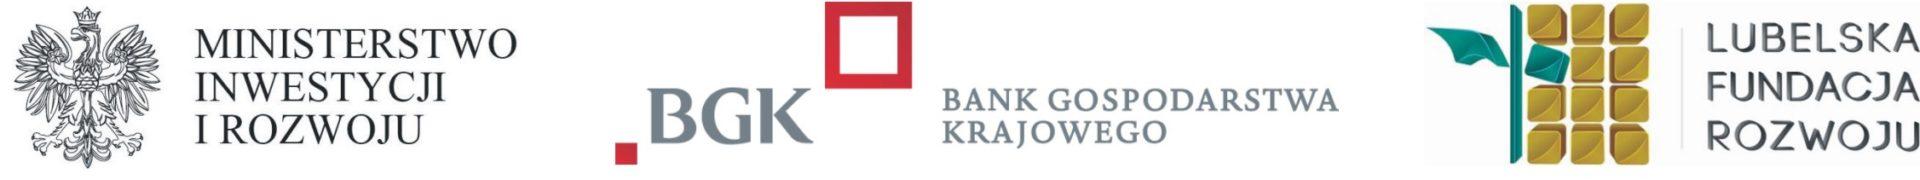 Trójznak z logo BGK